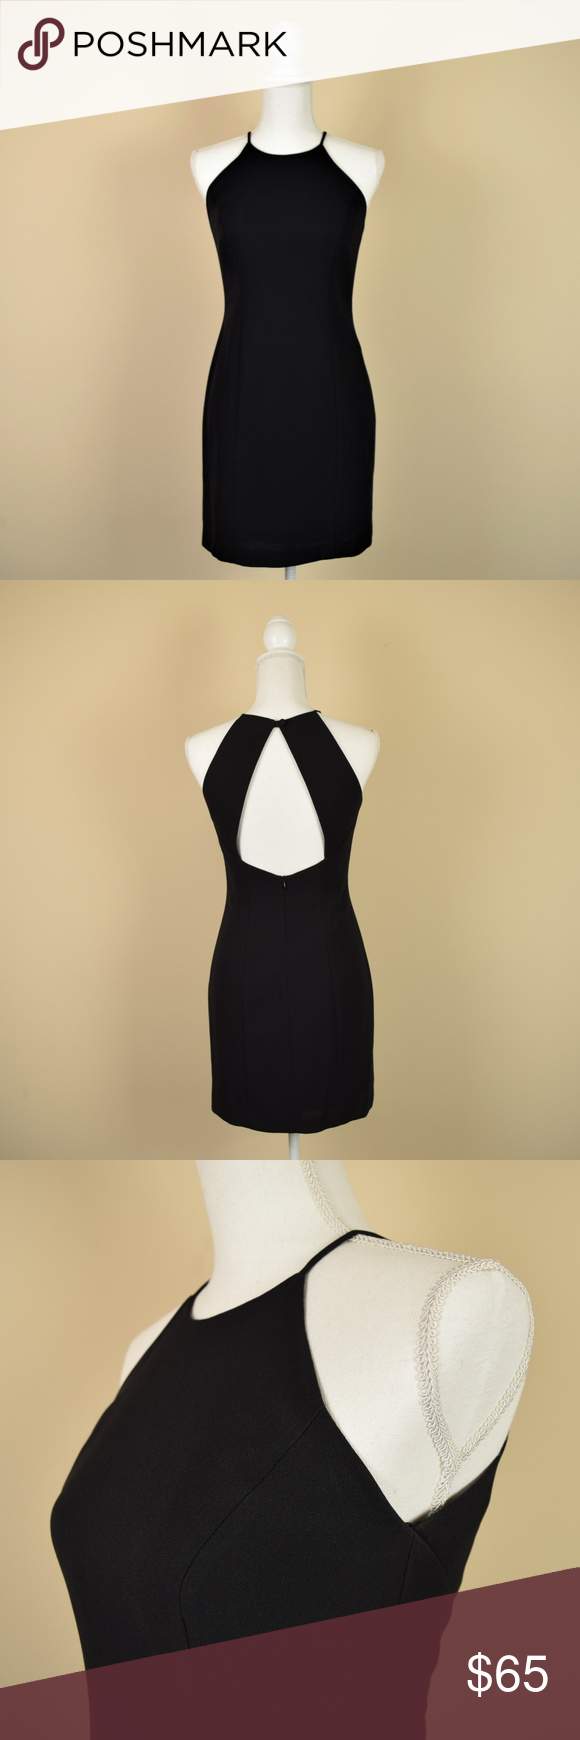 8f76eb67529d4 Laundry Shelli Segal Black Backless Halter Dress Sleek, minimalistic, and  chic, this Laundry